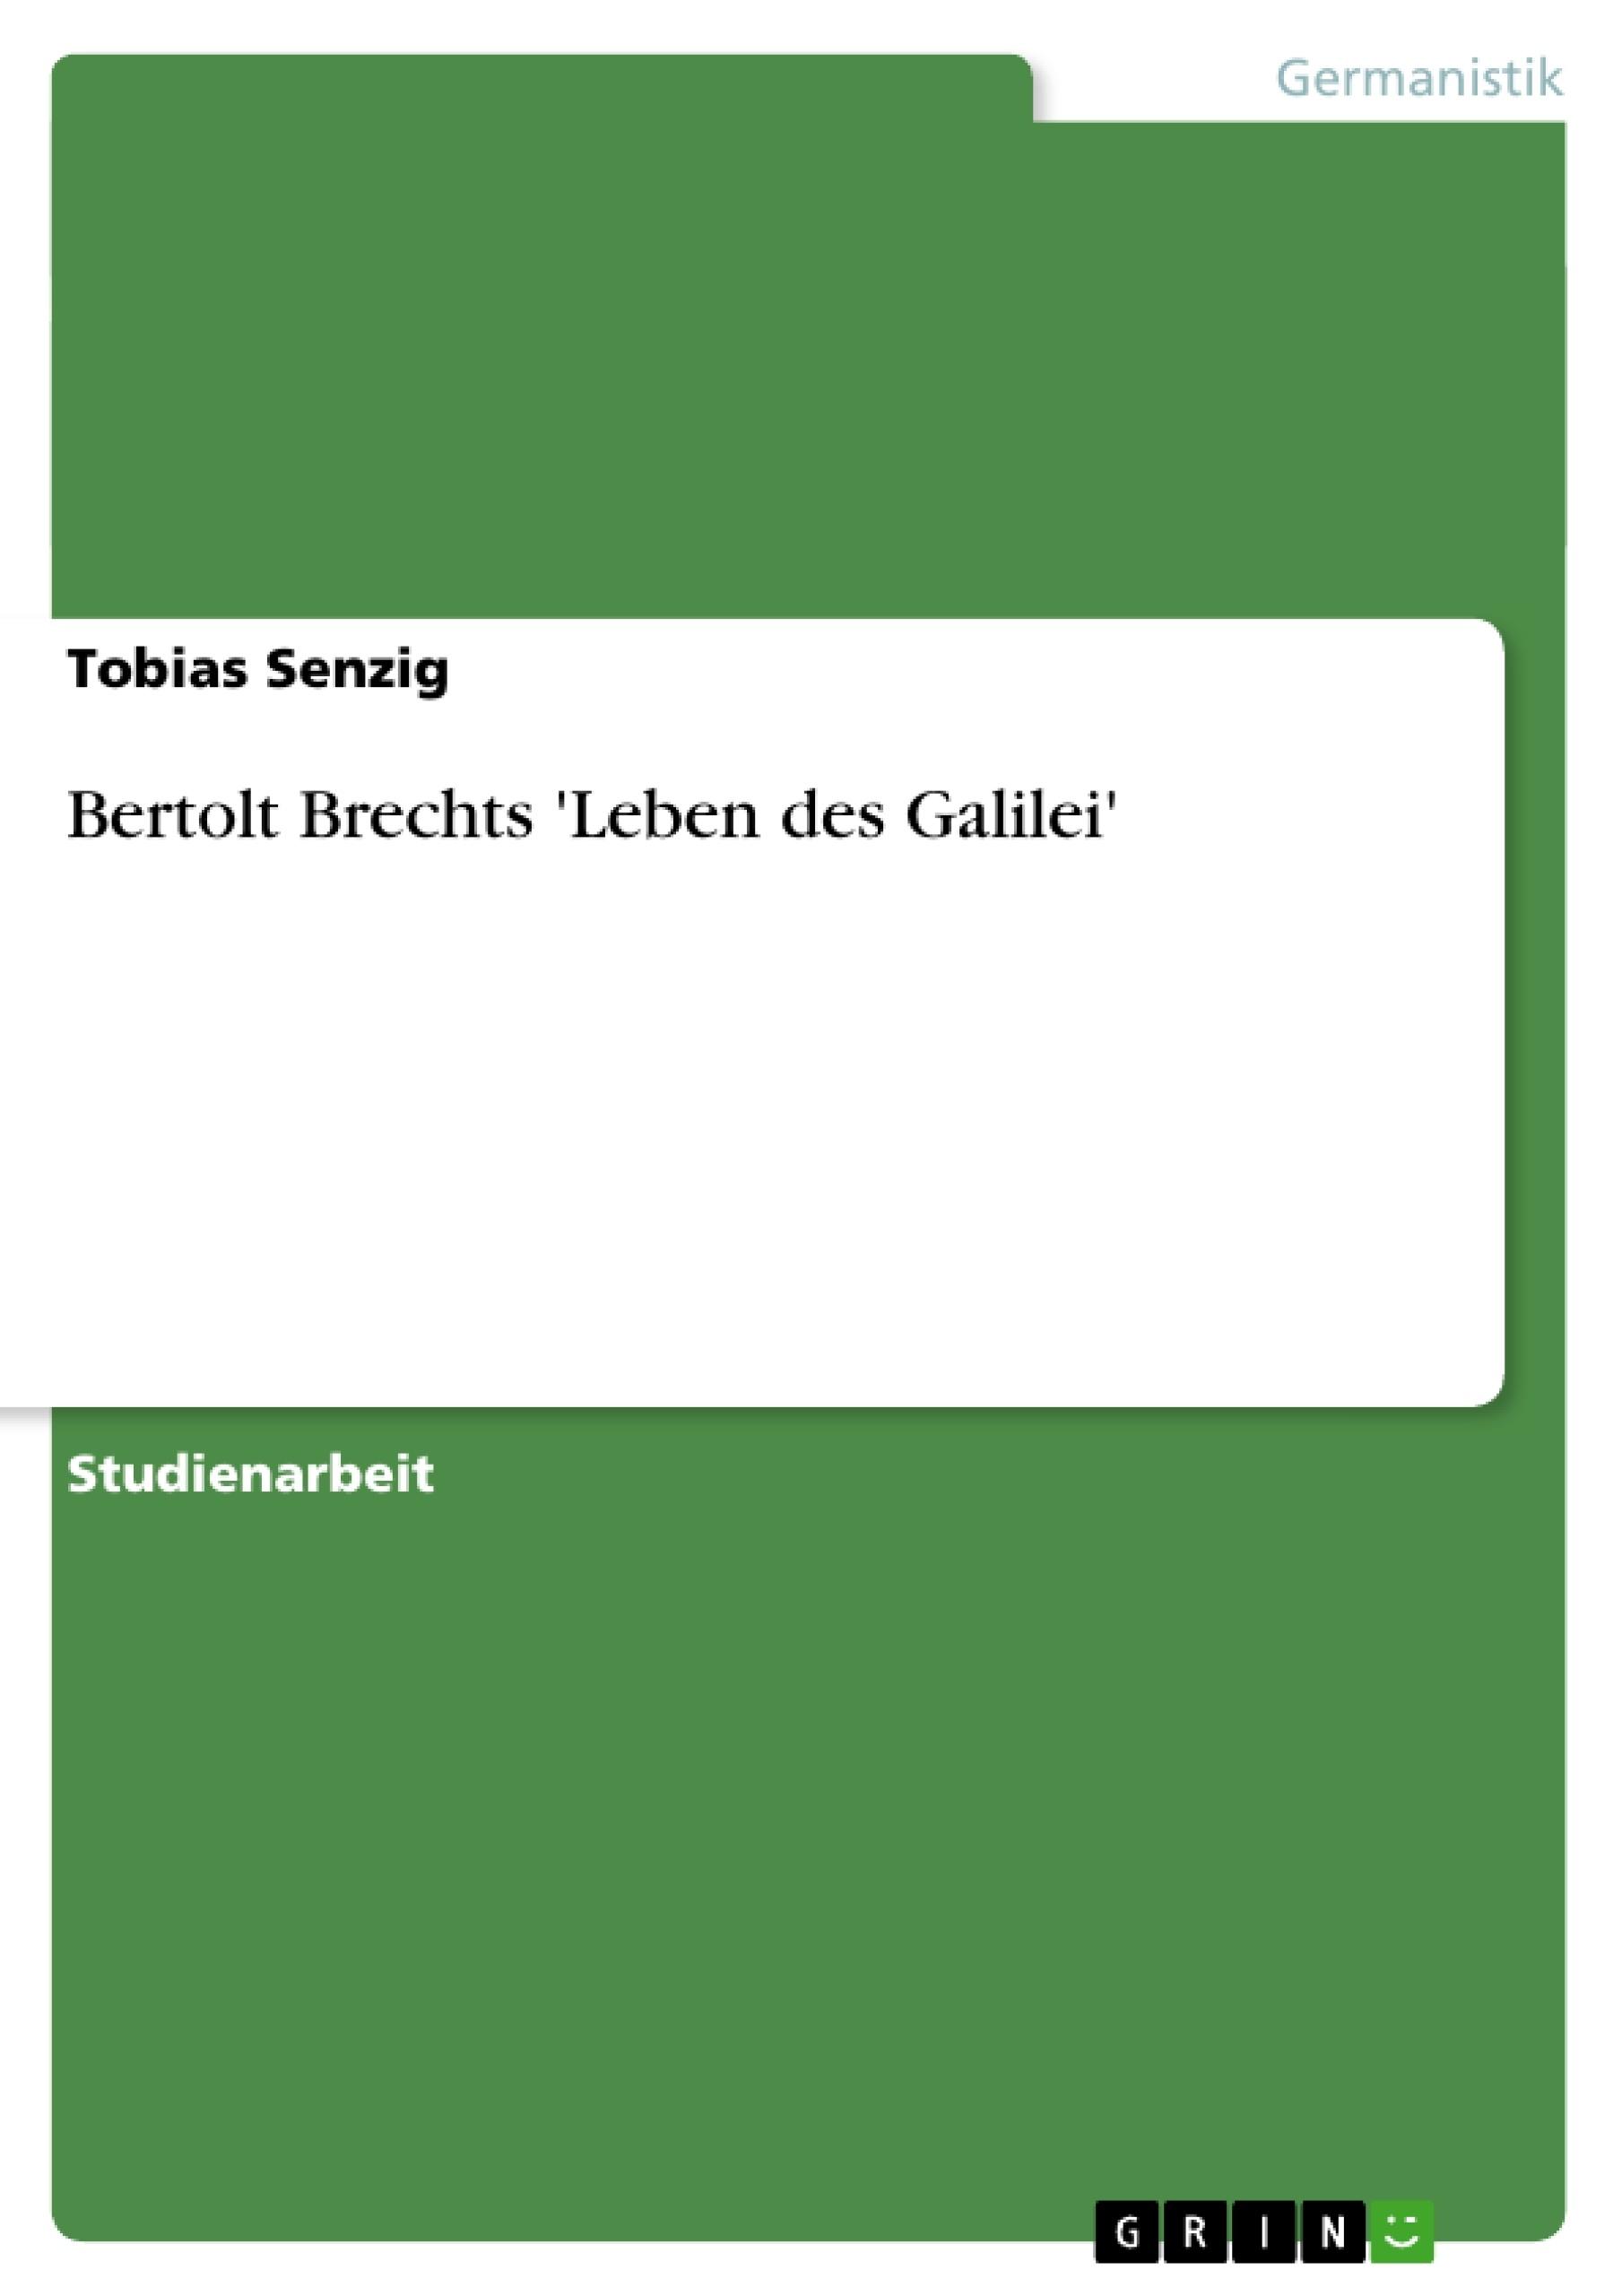 Titel: Bertolt Brechts 'Leben des Galilei'